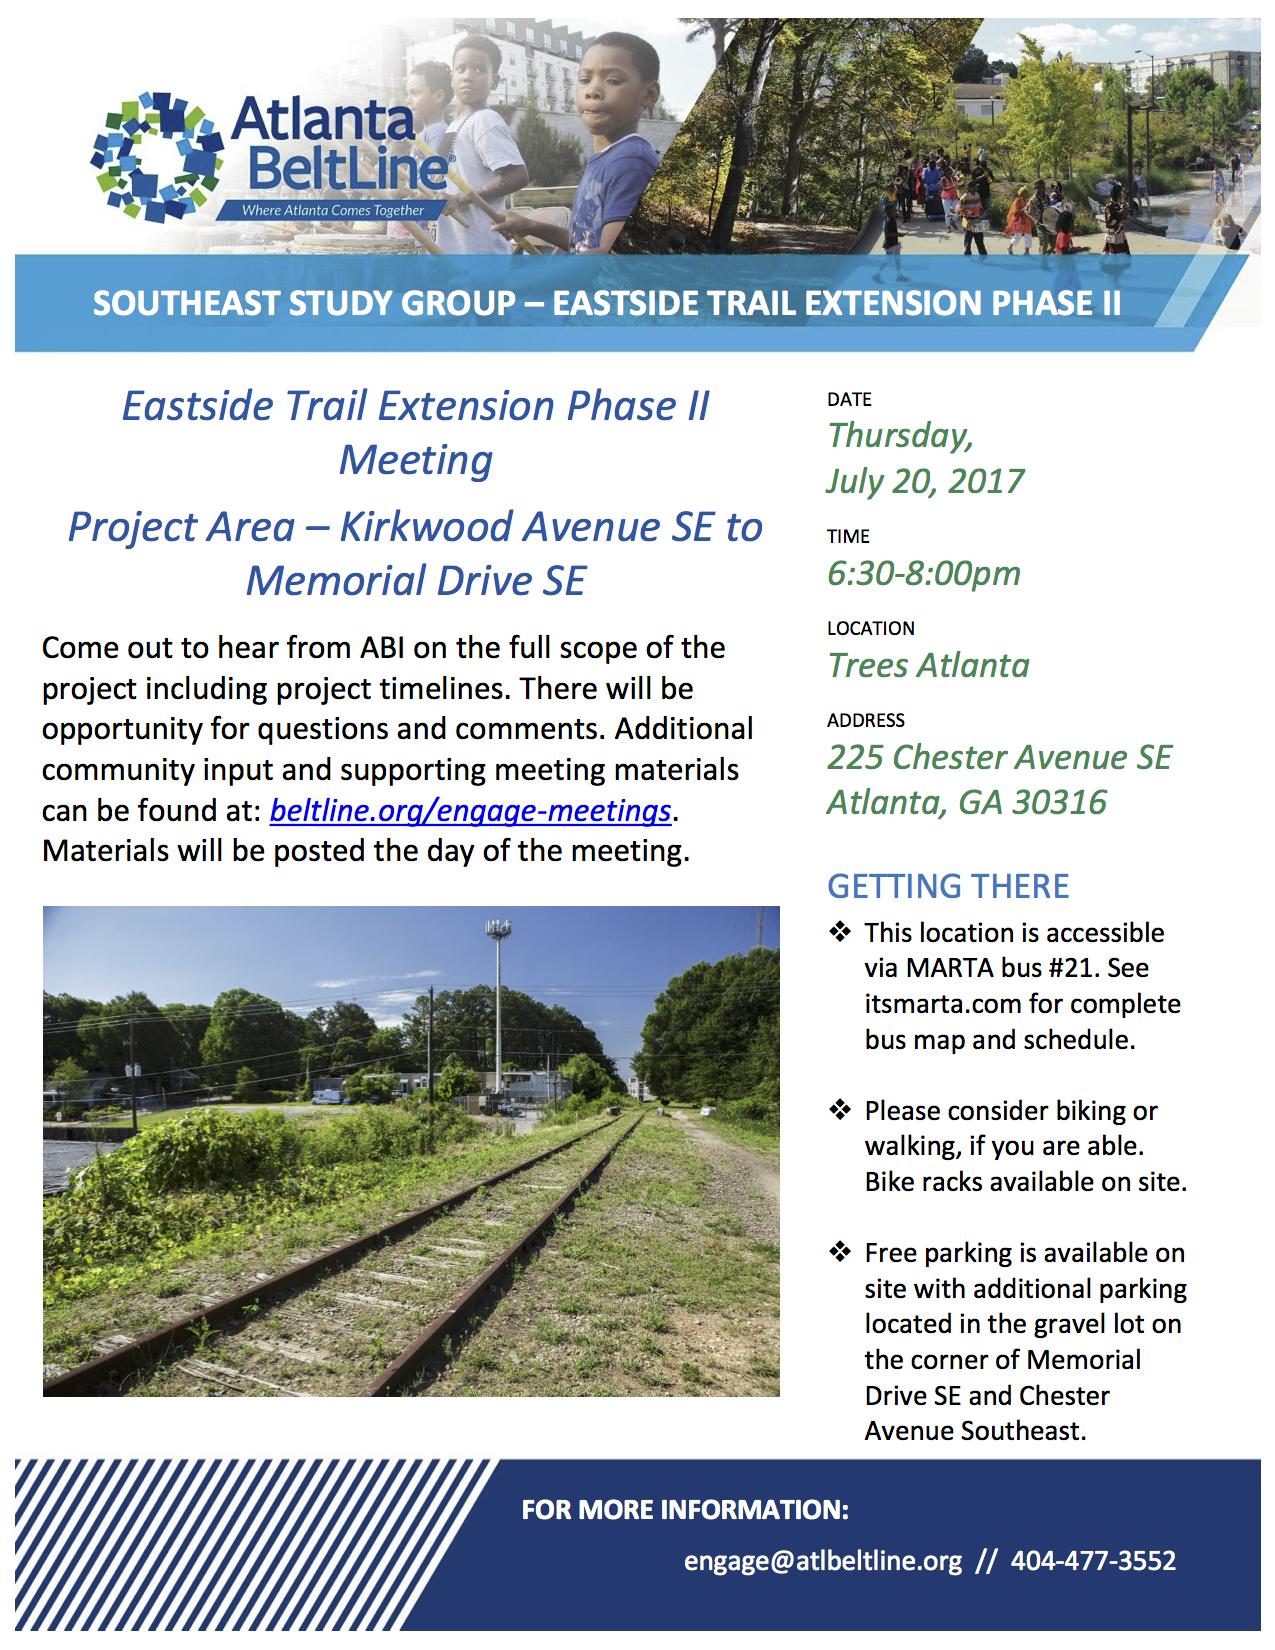 Atlanta Beltline Southeast Study Group 7/20/2017